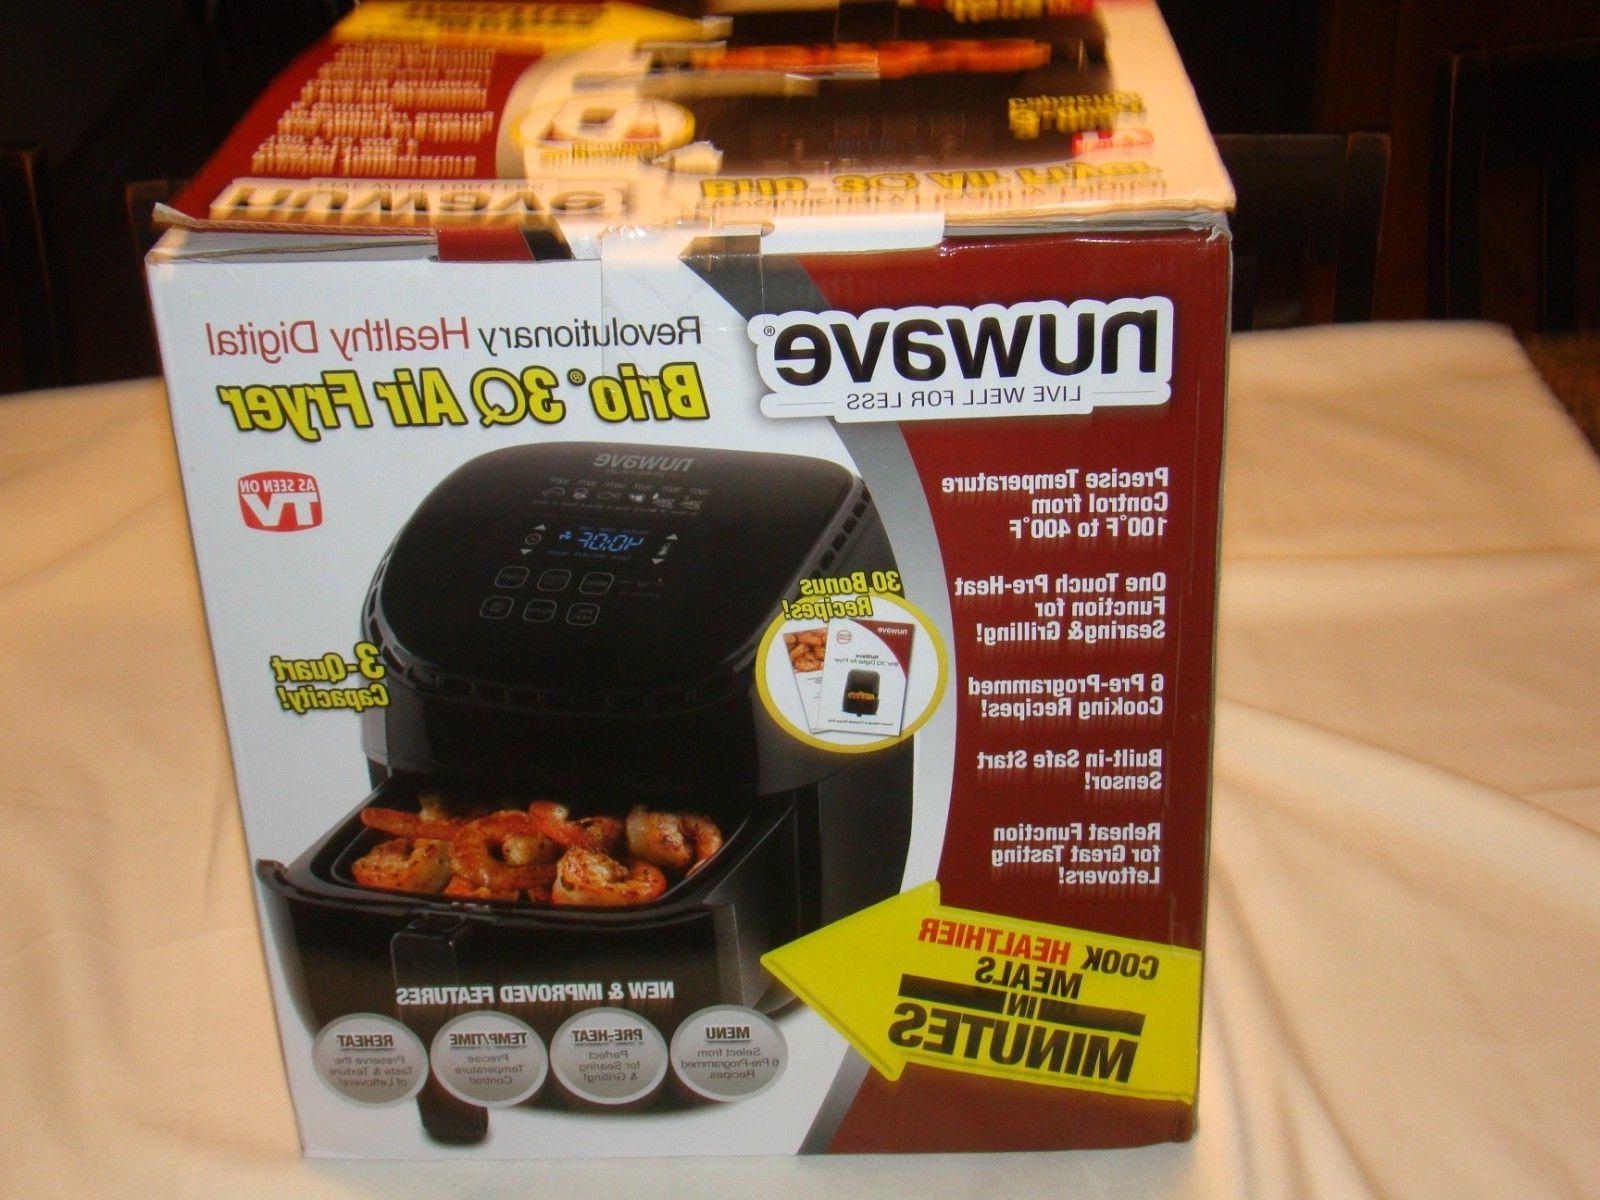 NuWave 3QT Electric Cooking Digital Air Deep Fryer